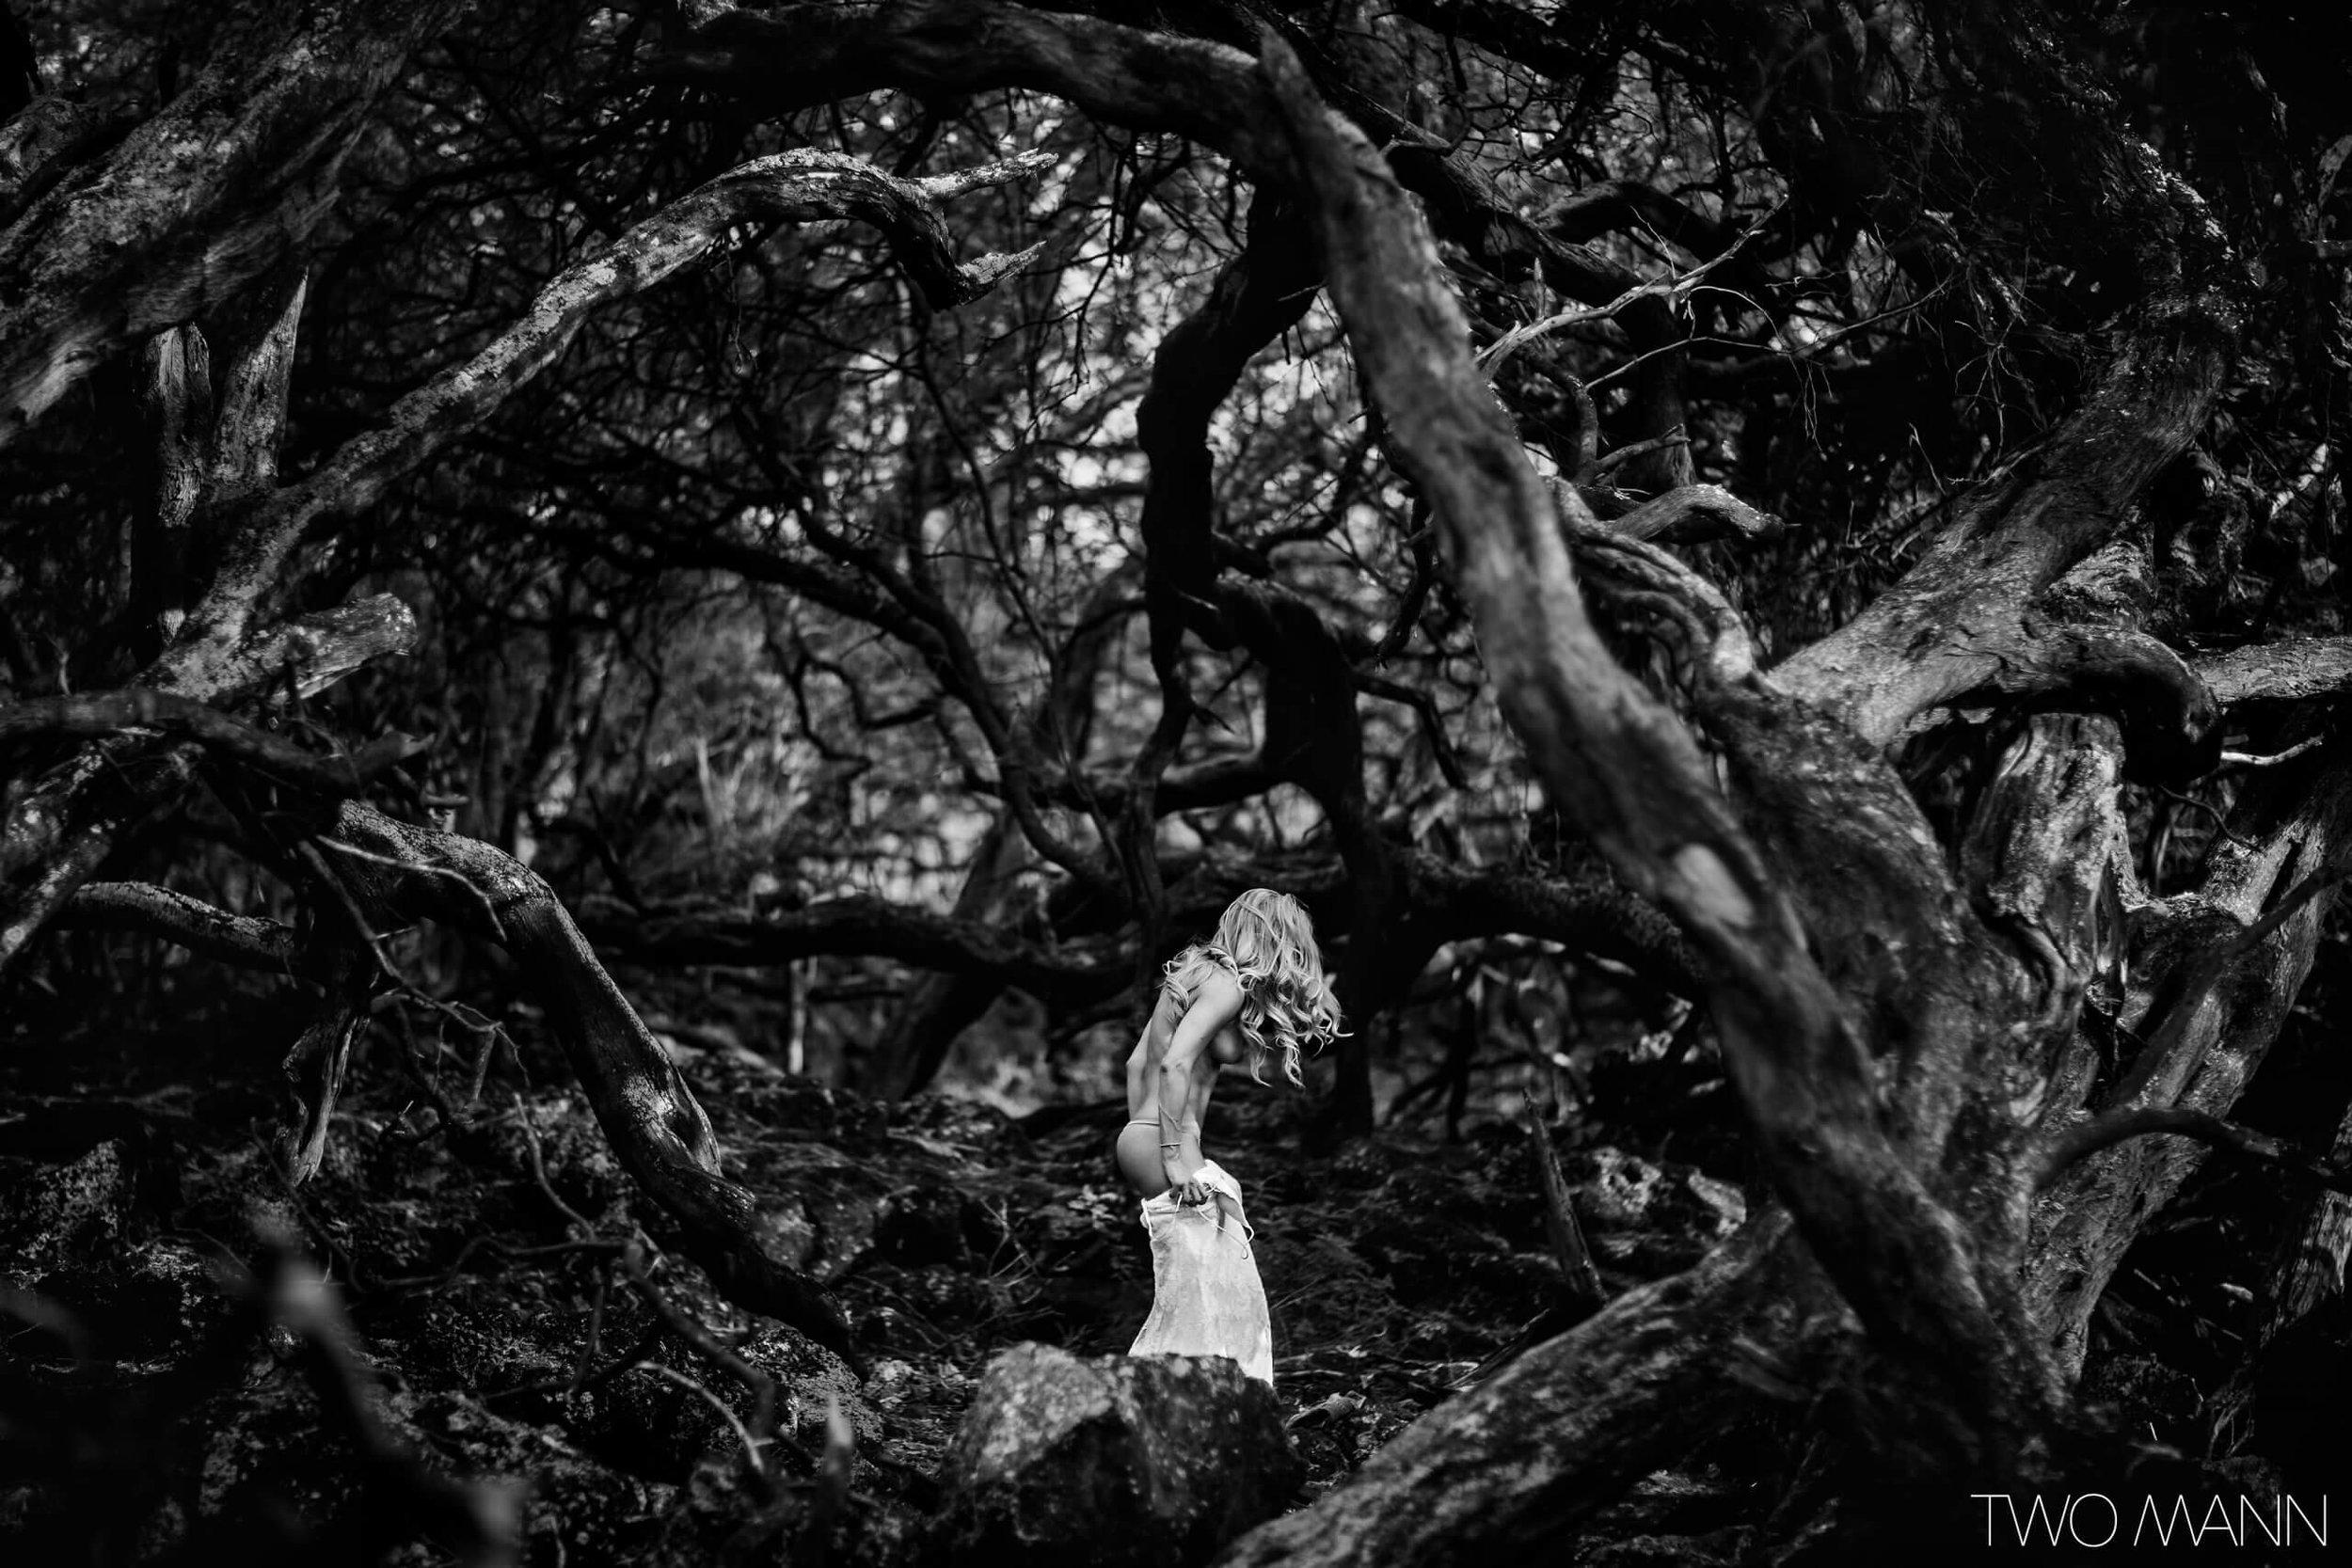 Two-Mann-Studios-Worlds-Best-Wedding-Photography-Best-of-2016-009-2560x1707.jpg